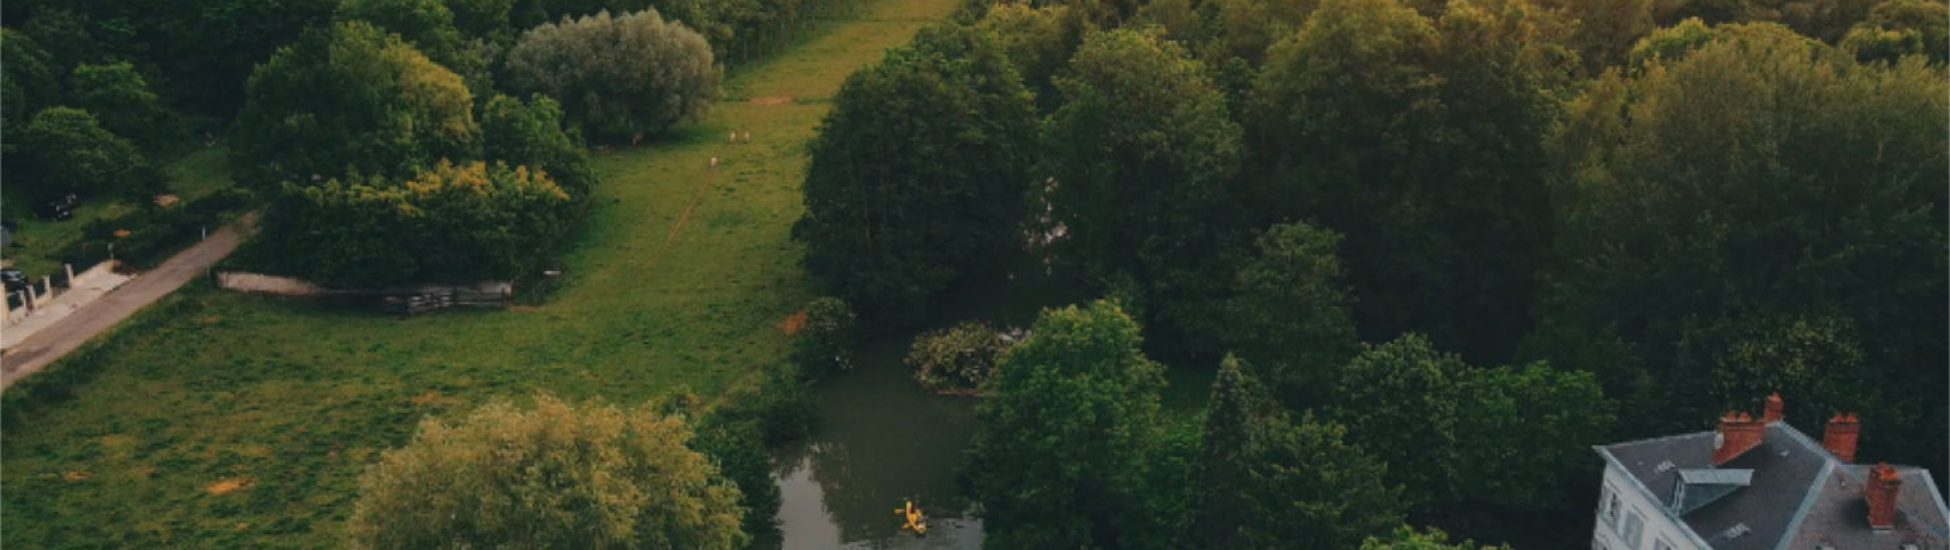 locadventure-location-canoe-kayak-pourquoi-nous-choisir